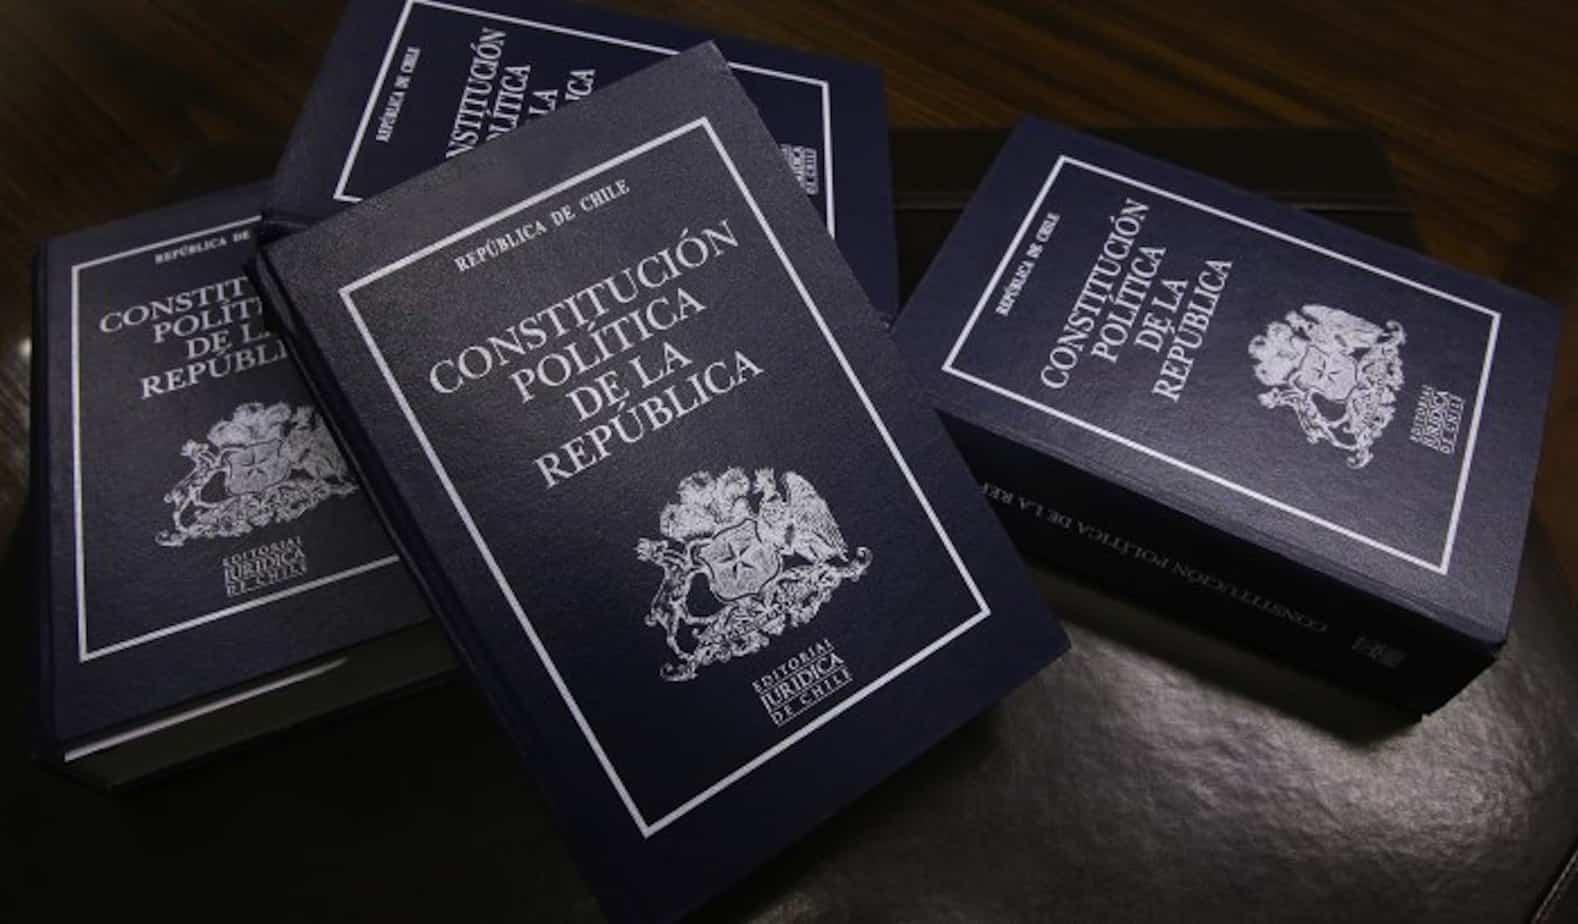 Chile busca acuerdo para postergar plebiscito constitucional por el COVID-19; UDI quiere mantener fecha